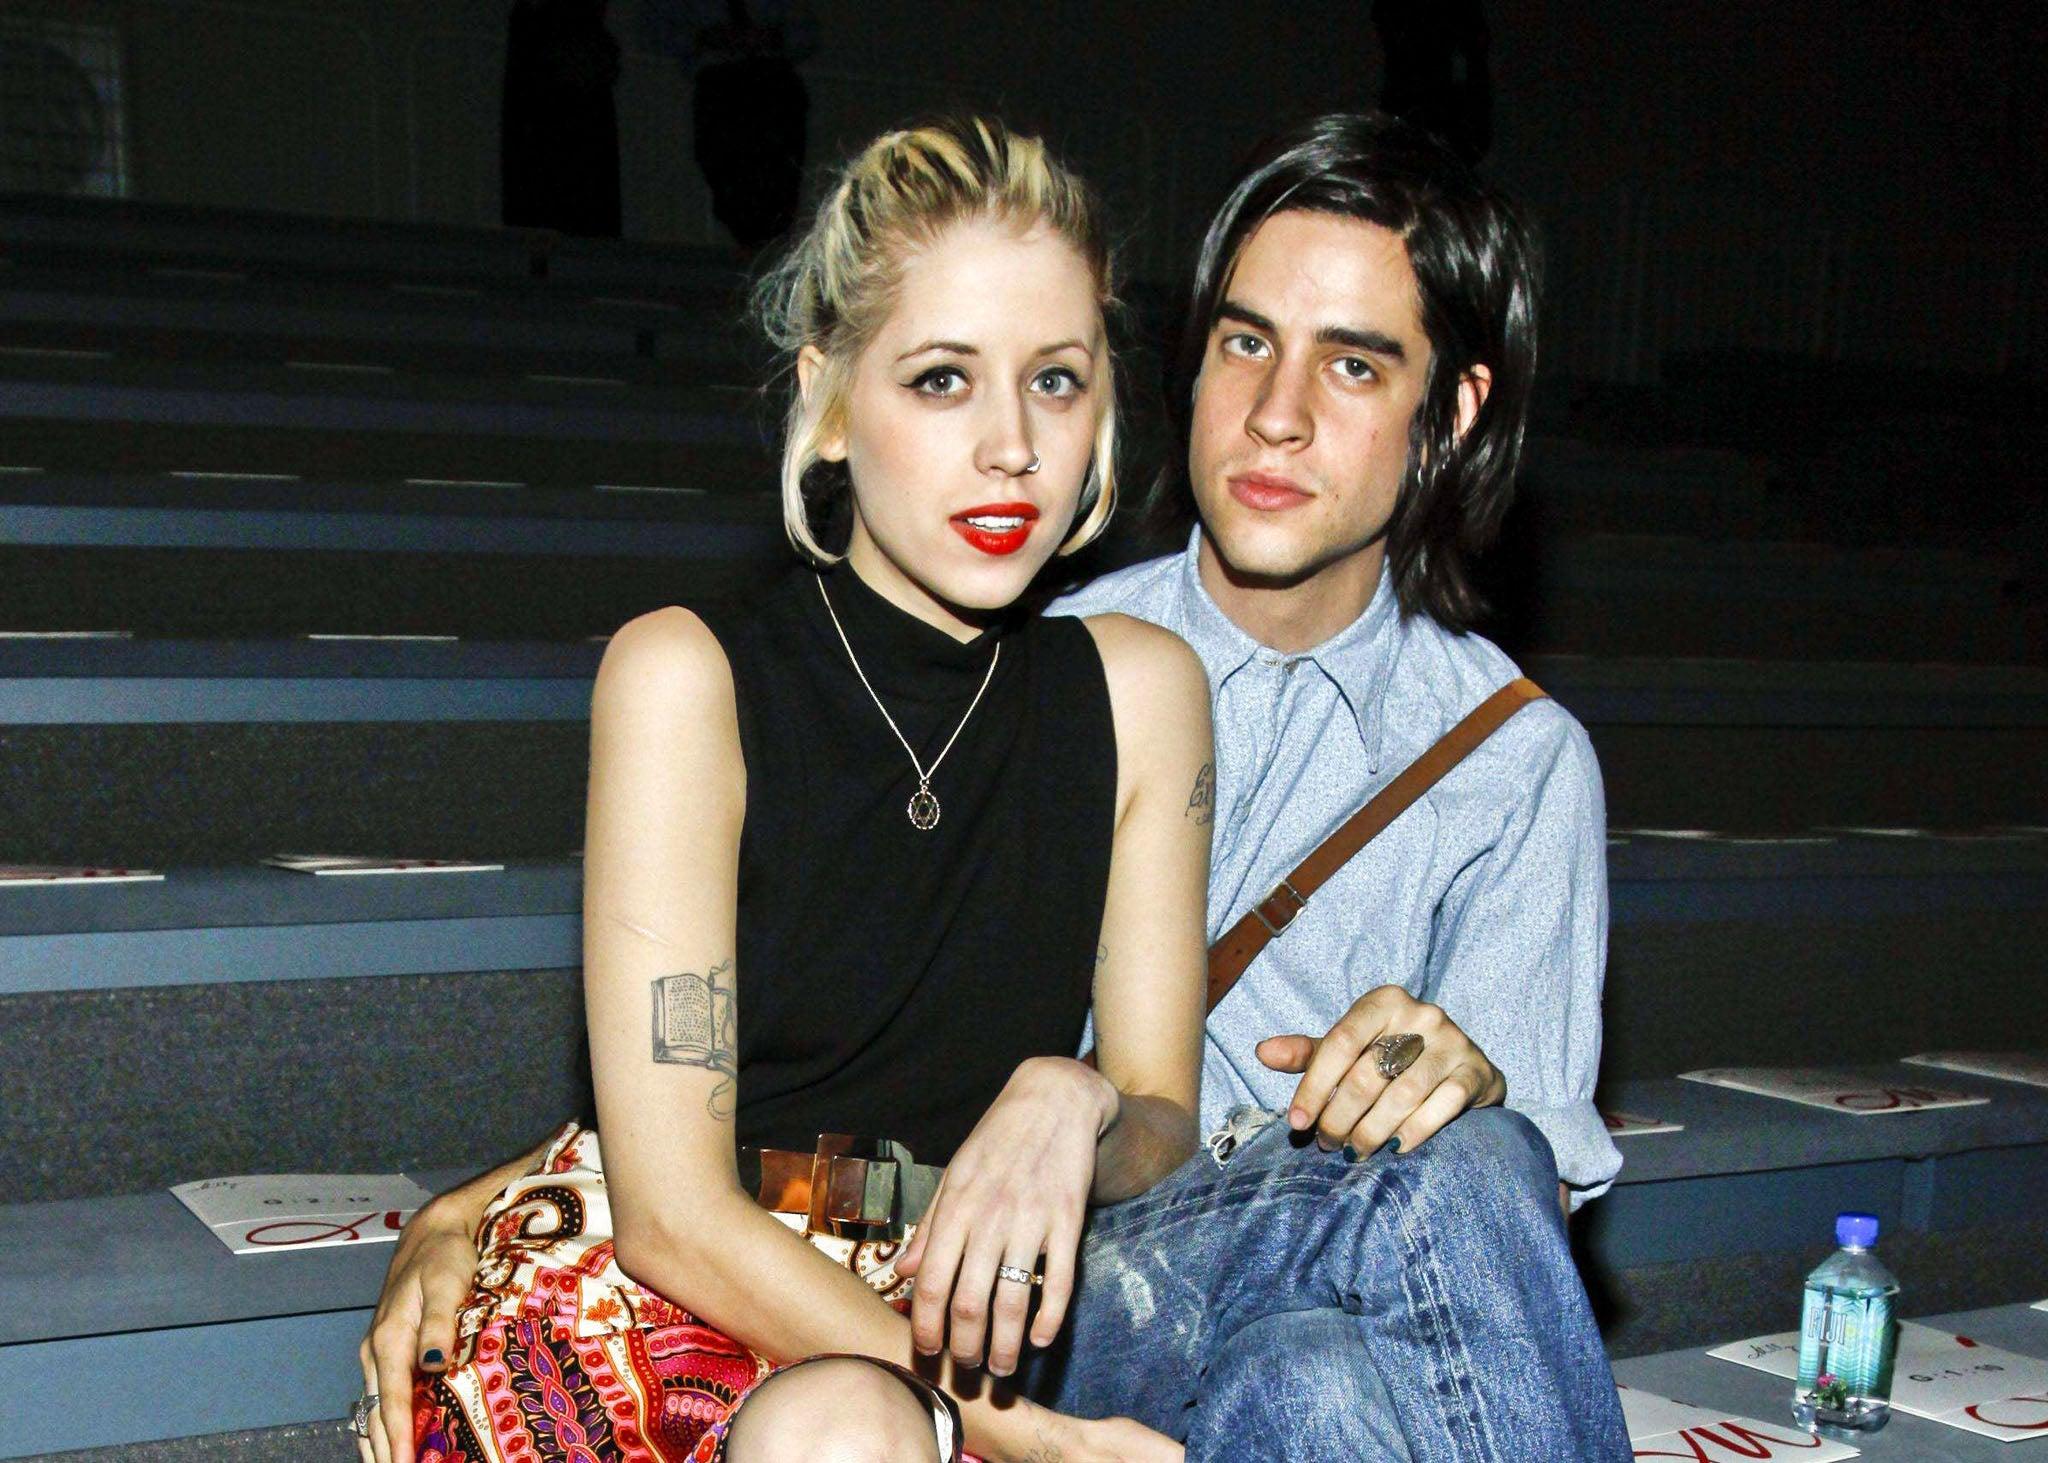 Peaches geldof dating